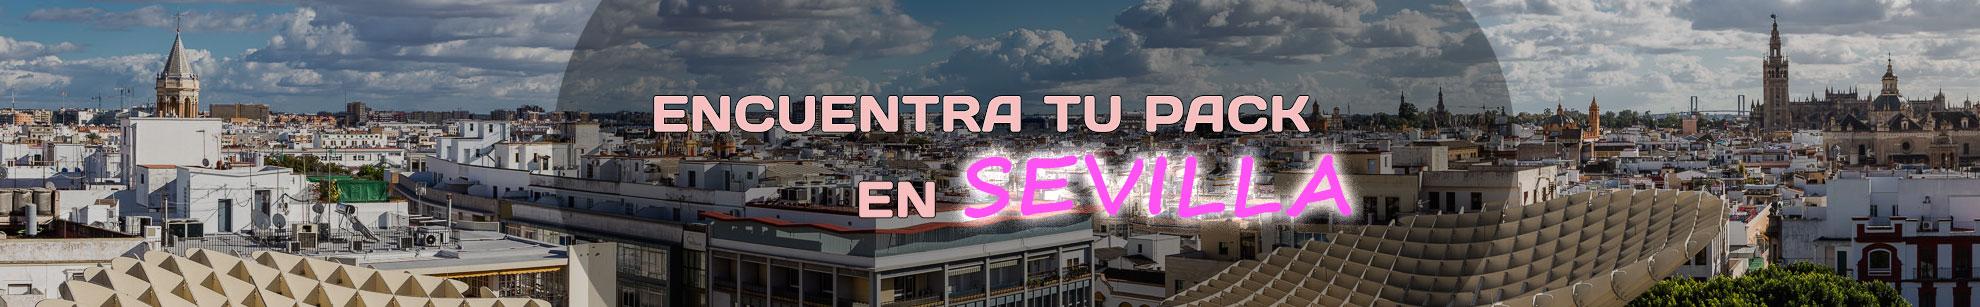 Ofertas despedidas en Sevilla